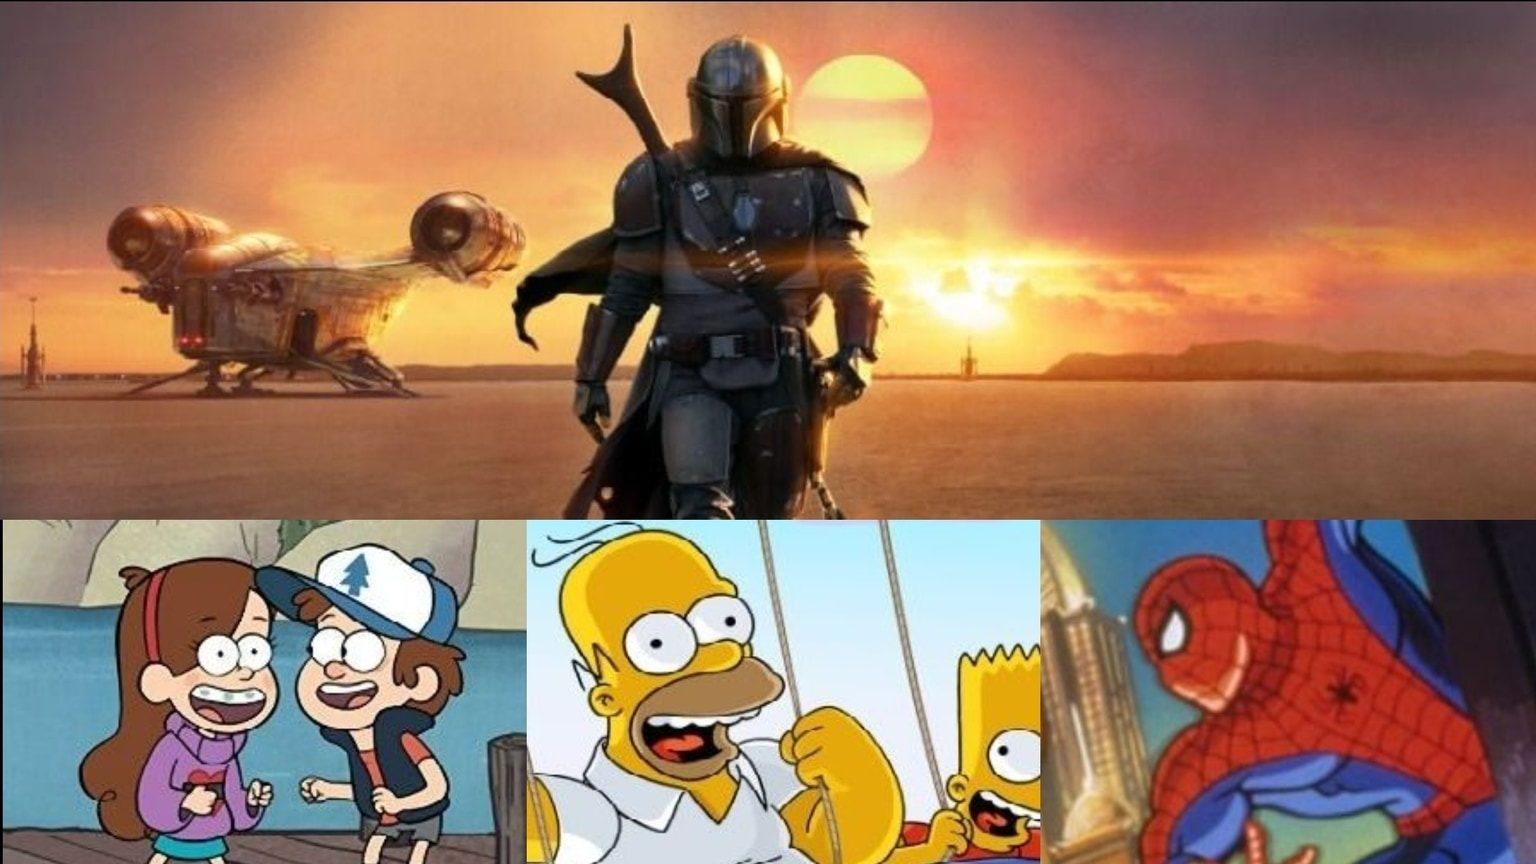 Collage of Disney Plus TV shows